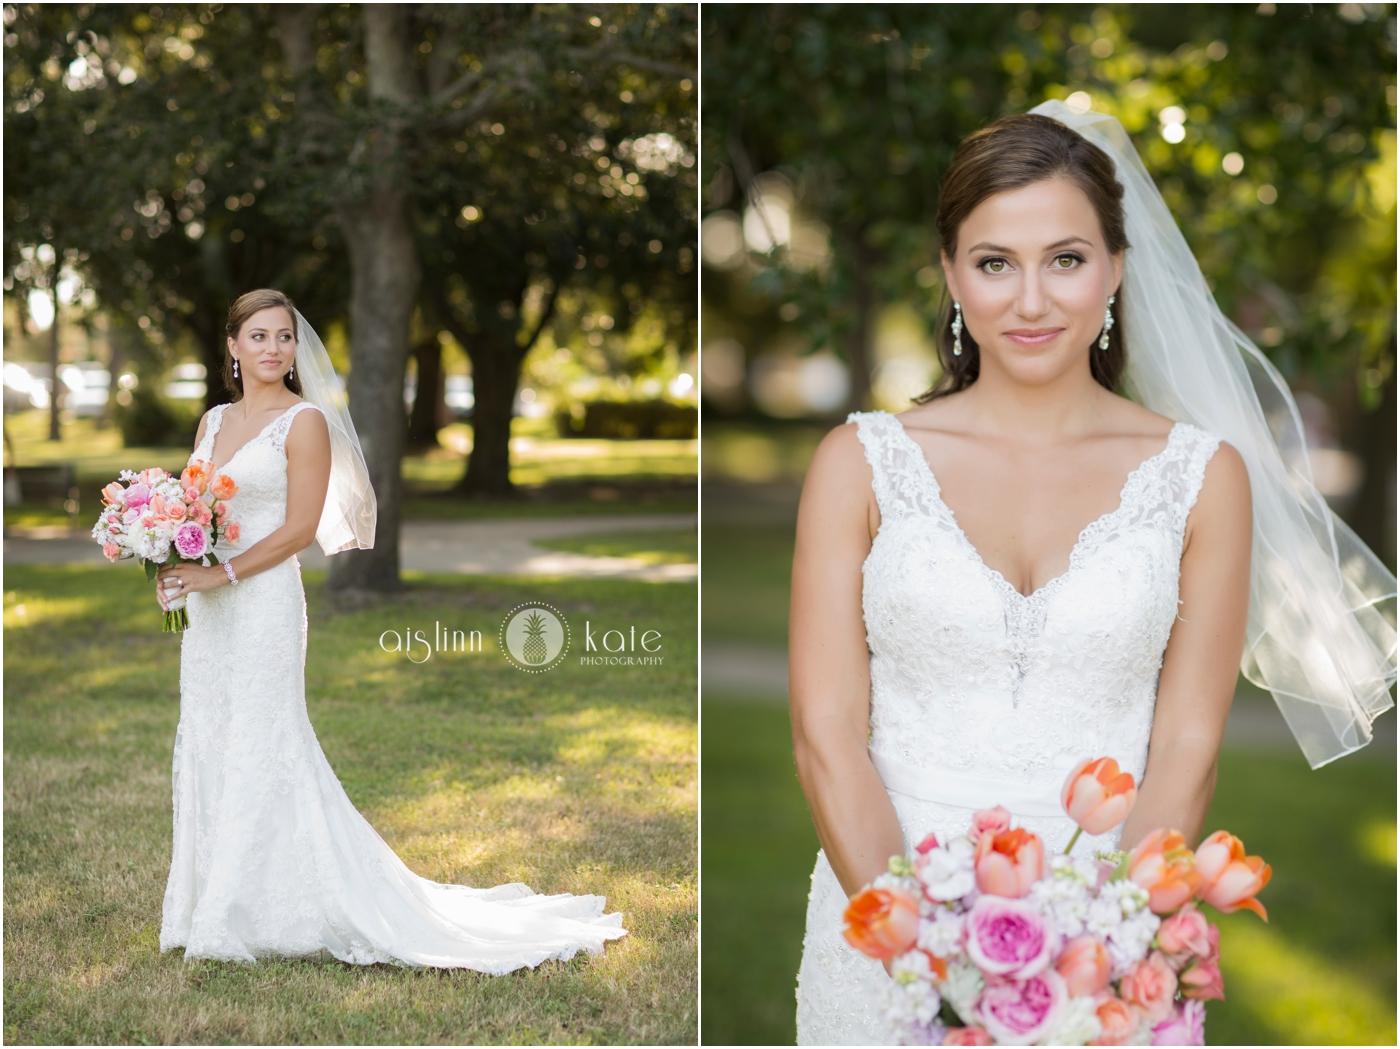 Pensacola-Destin-Wedding-Photographer-7593.jpg